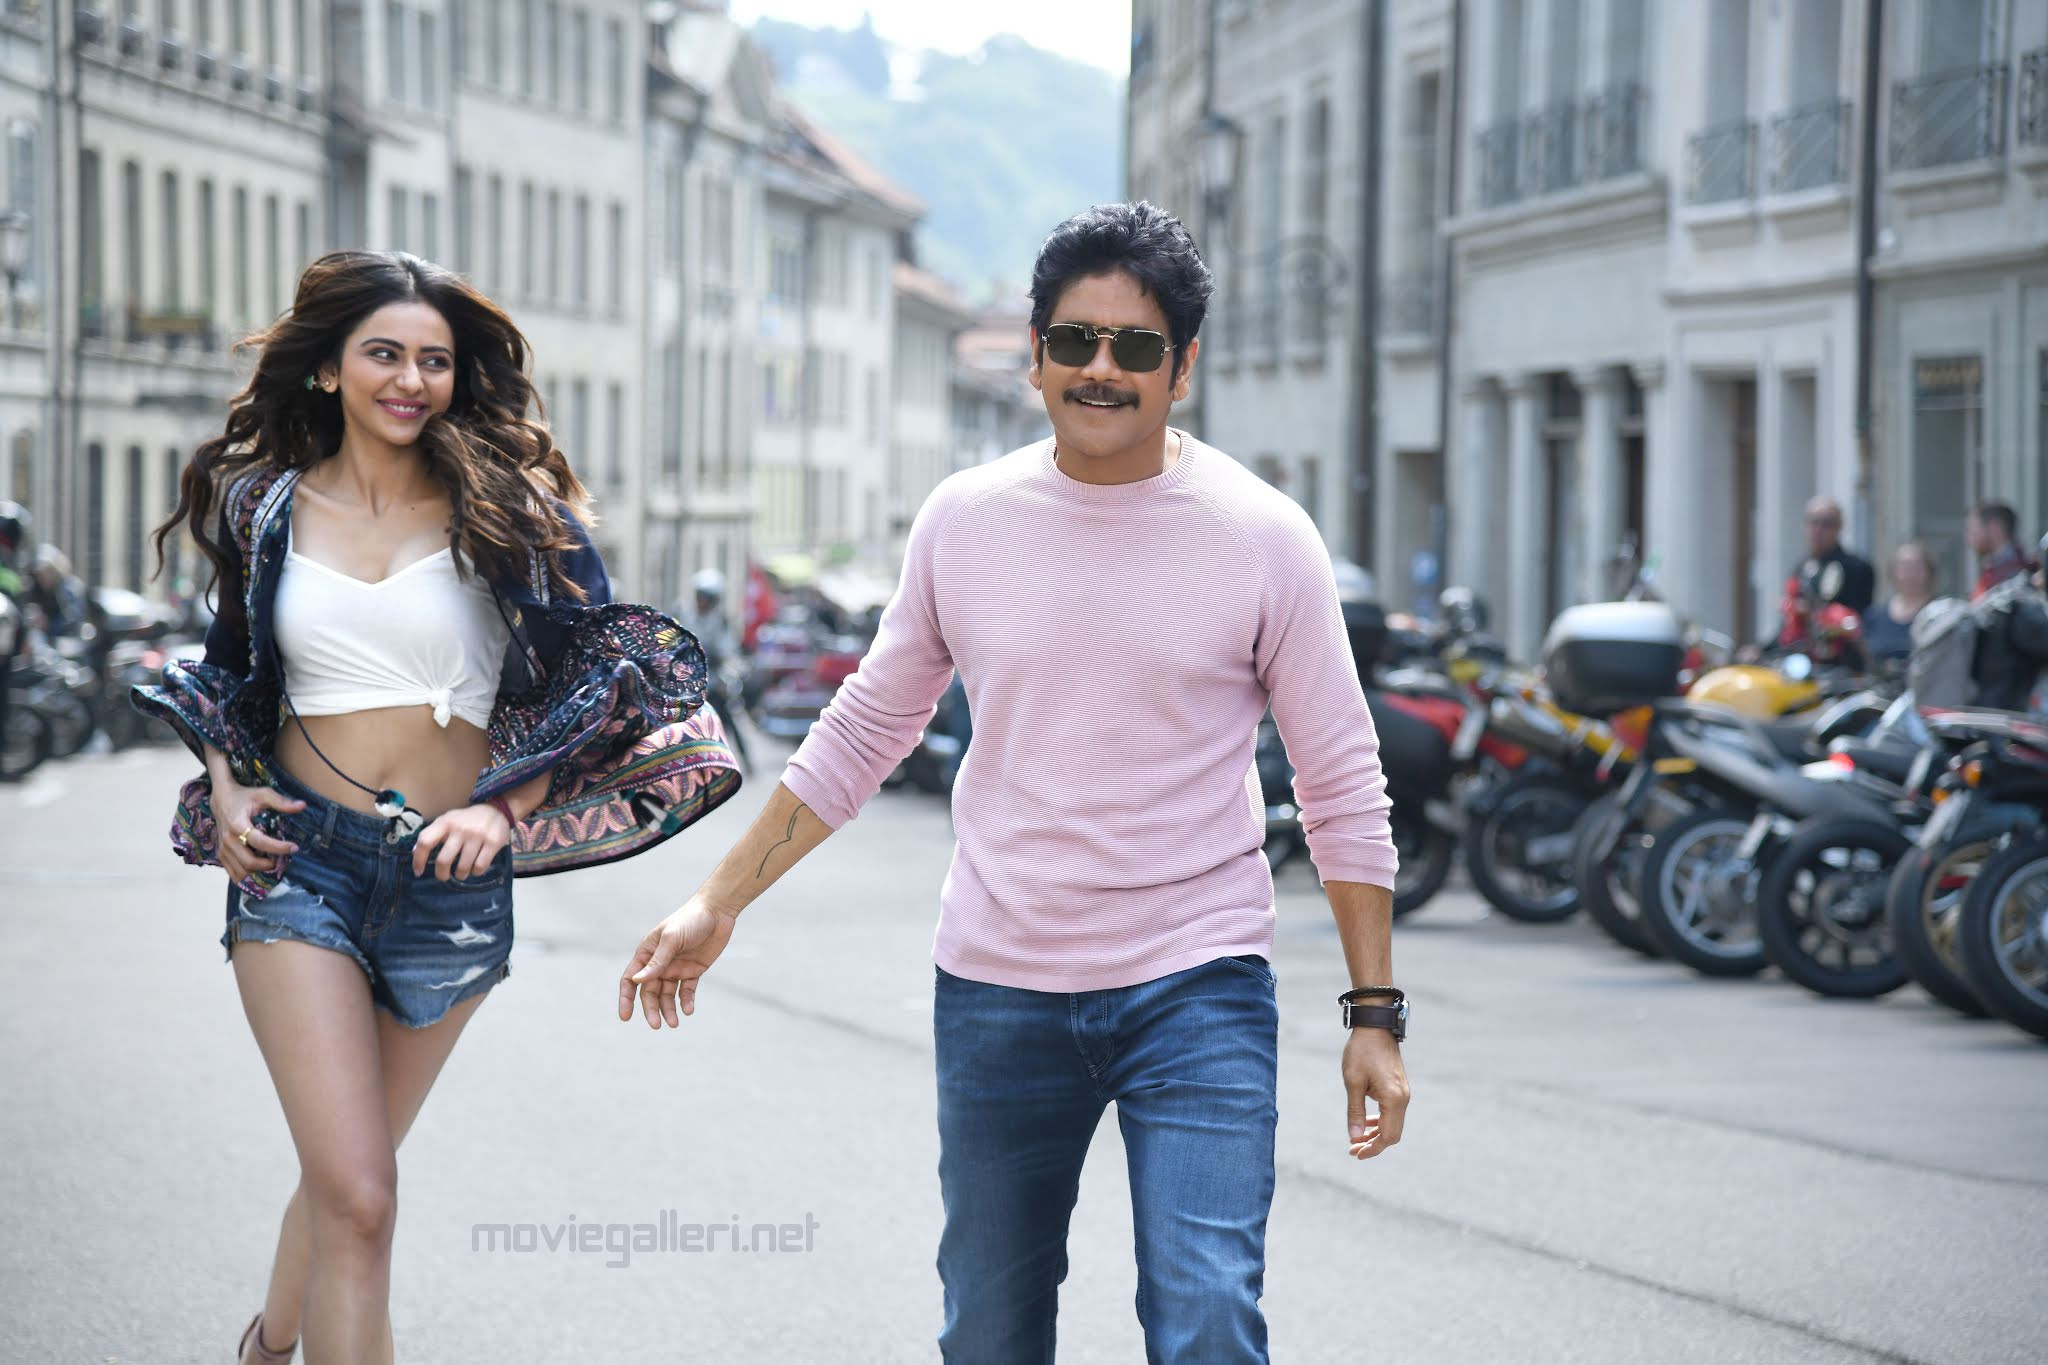 Nagarjuna Akkineni, Rakul Preet's 'Manmadhudu 2' Trailer is all set to launch on July 25th